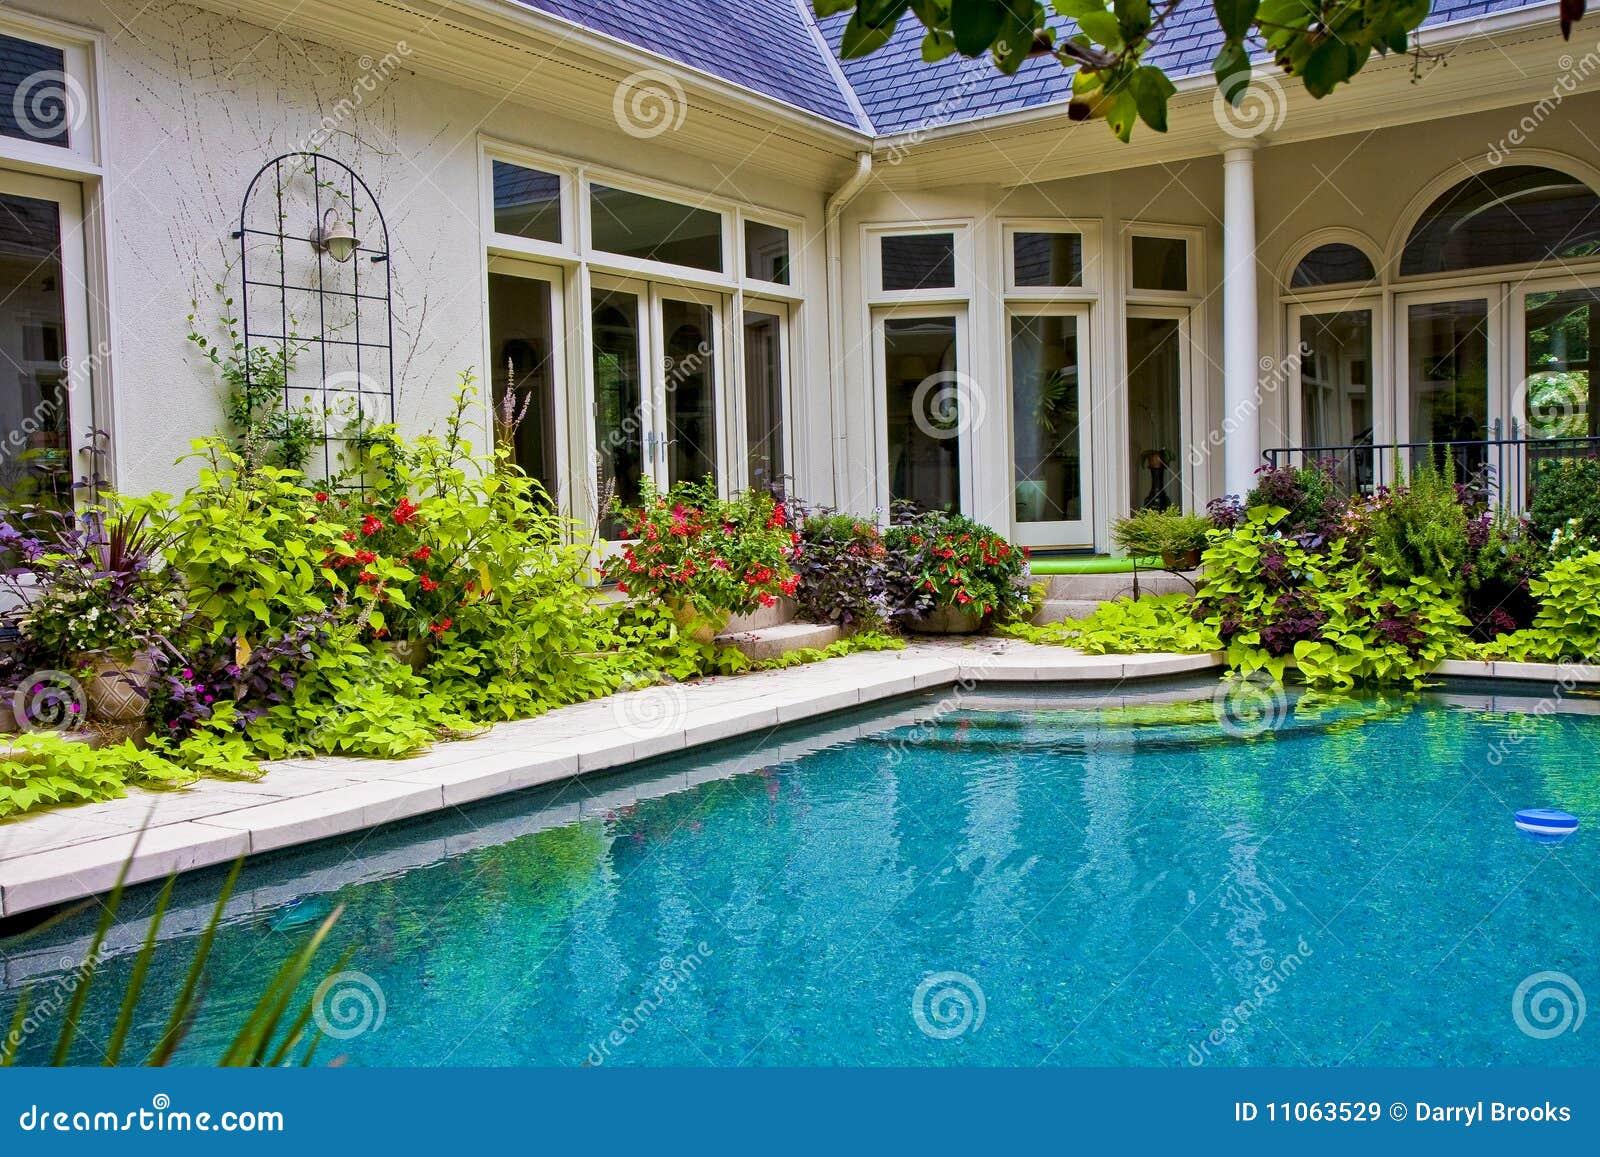 Garden Around Pool Stock Image Image Of House Blue